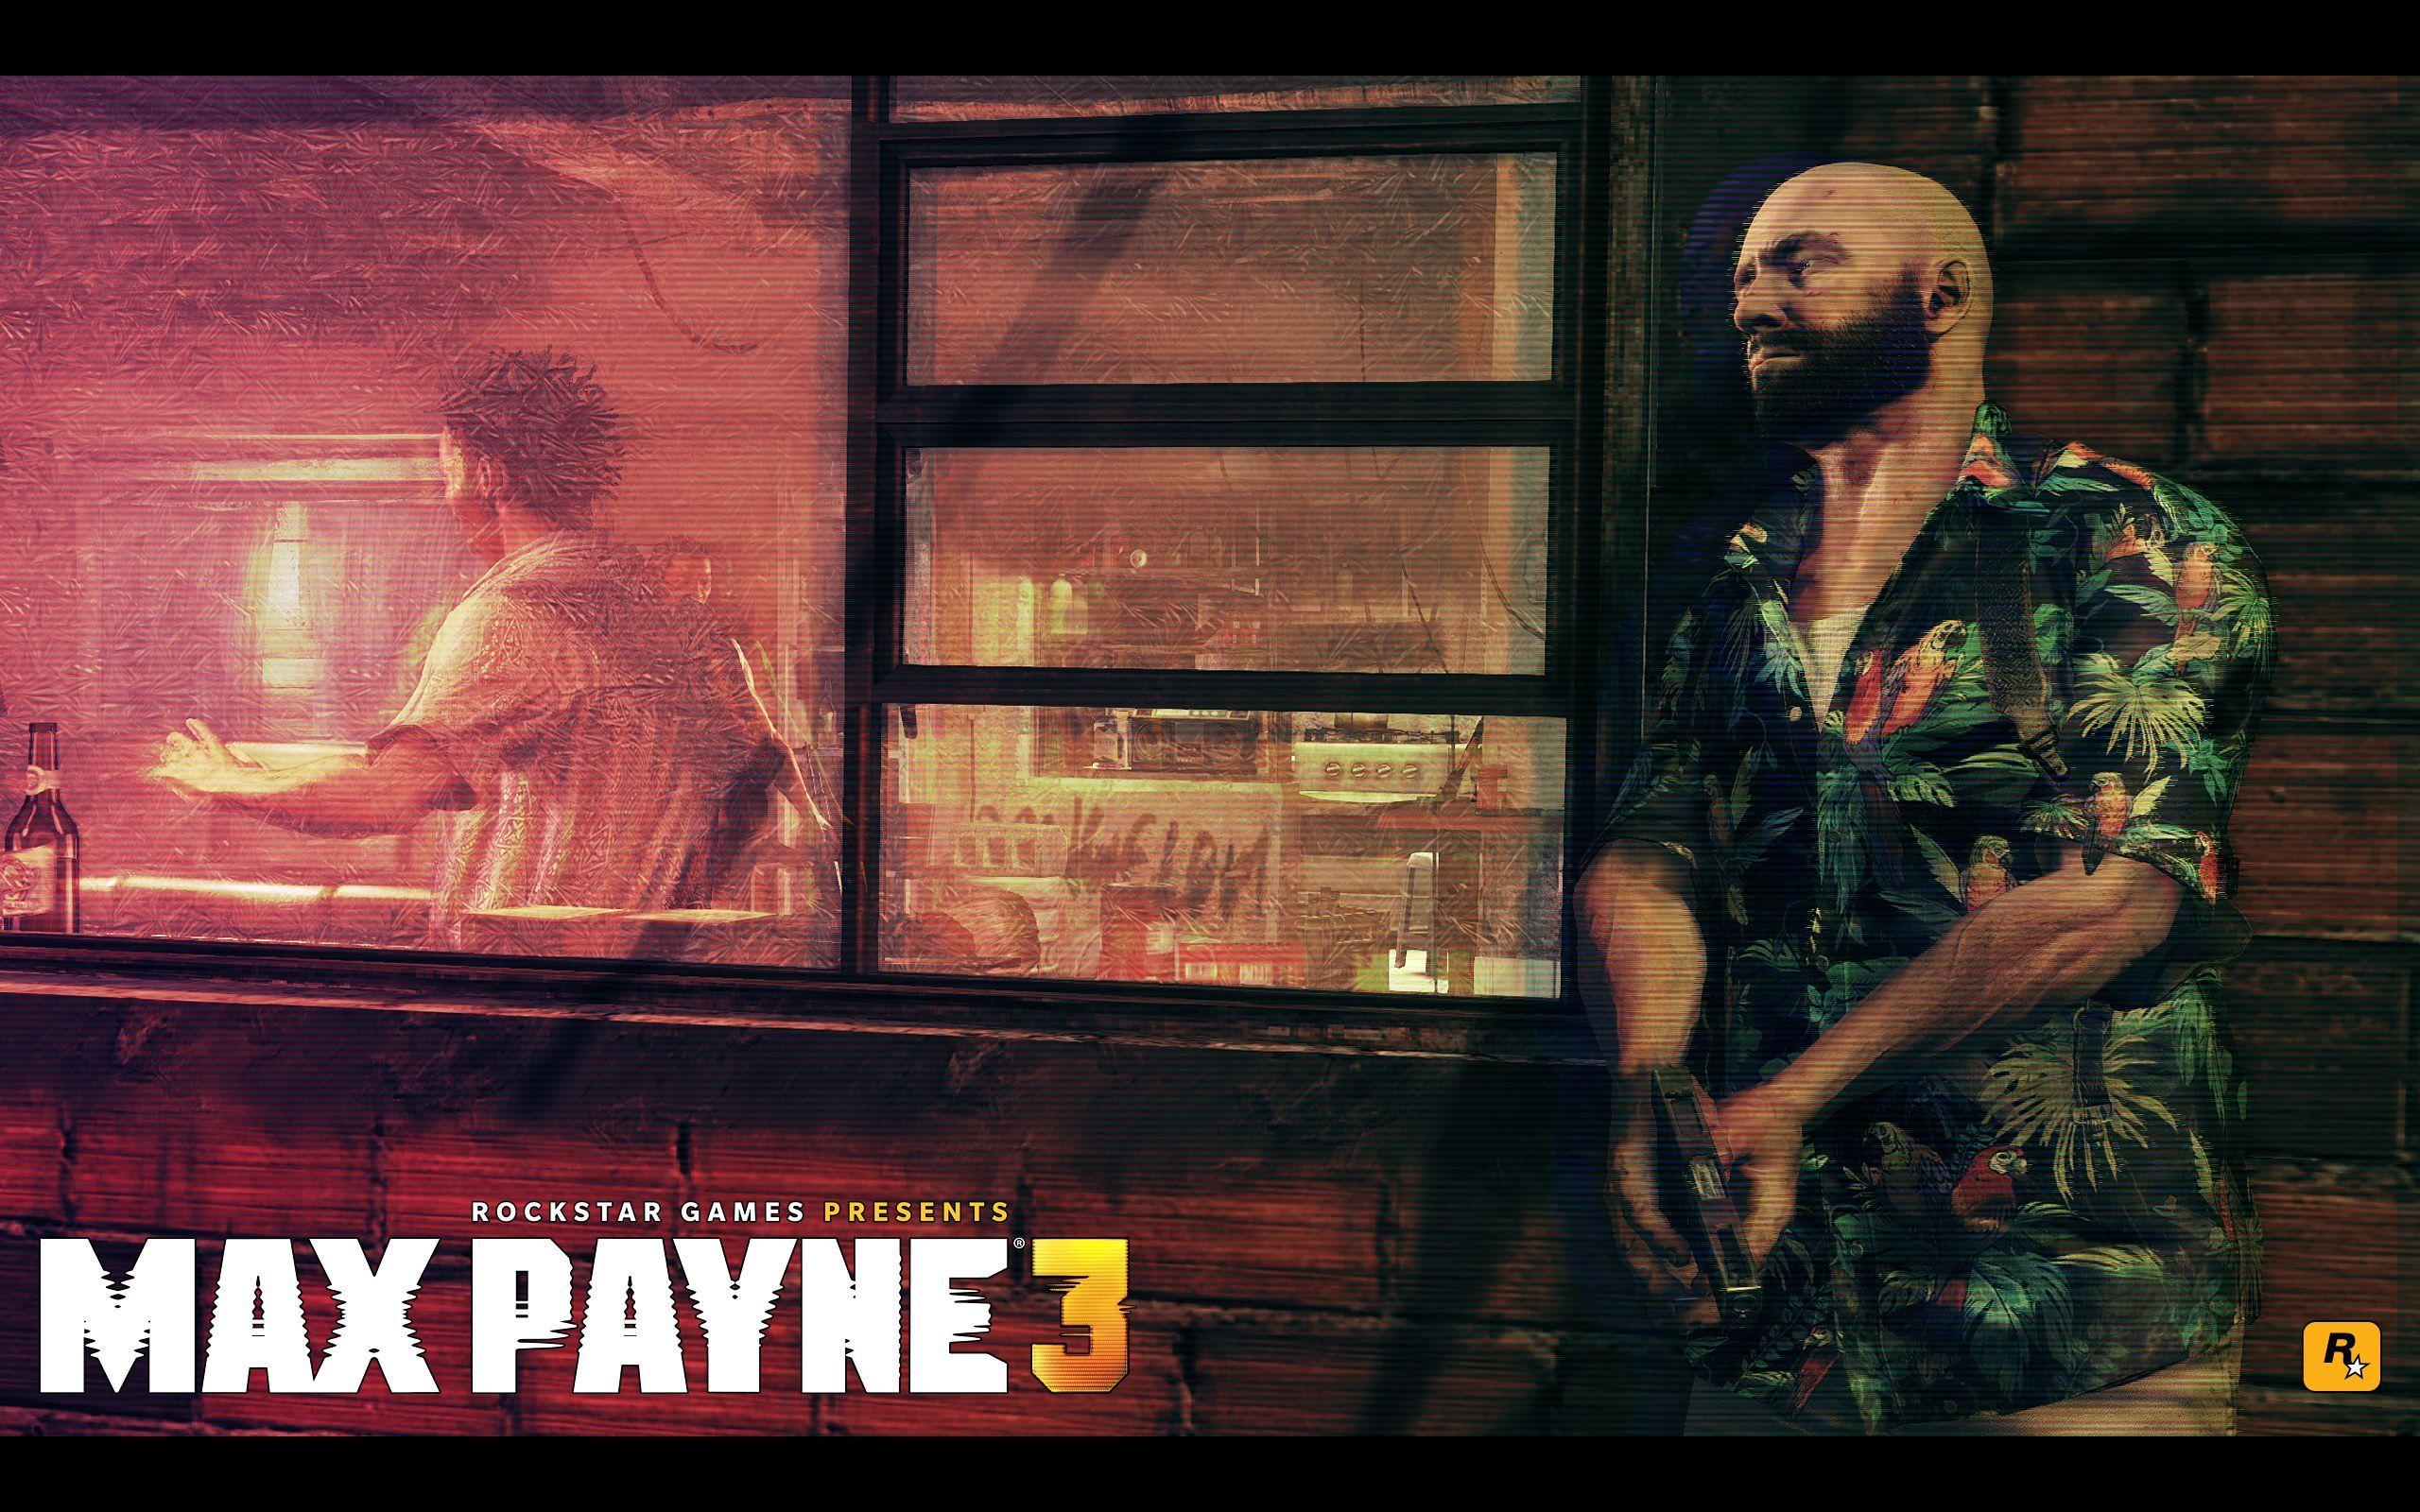 Max Payne 3 Wallpapers Unp Me